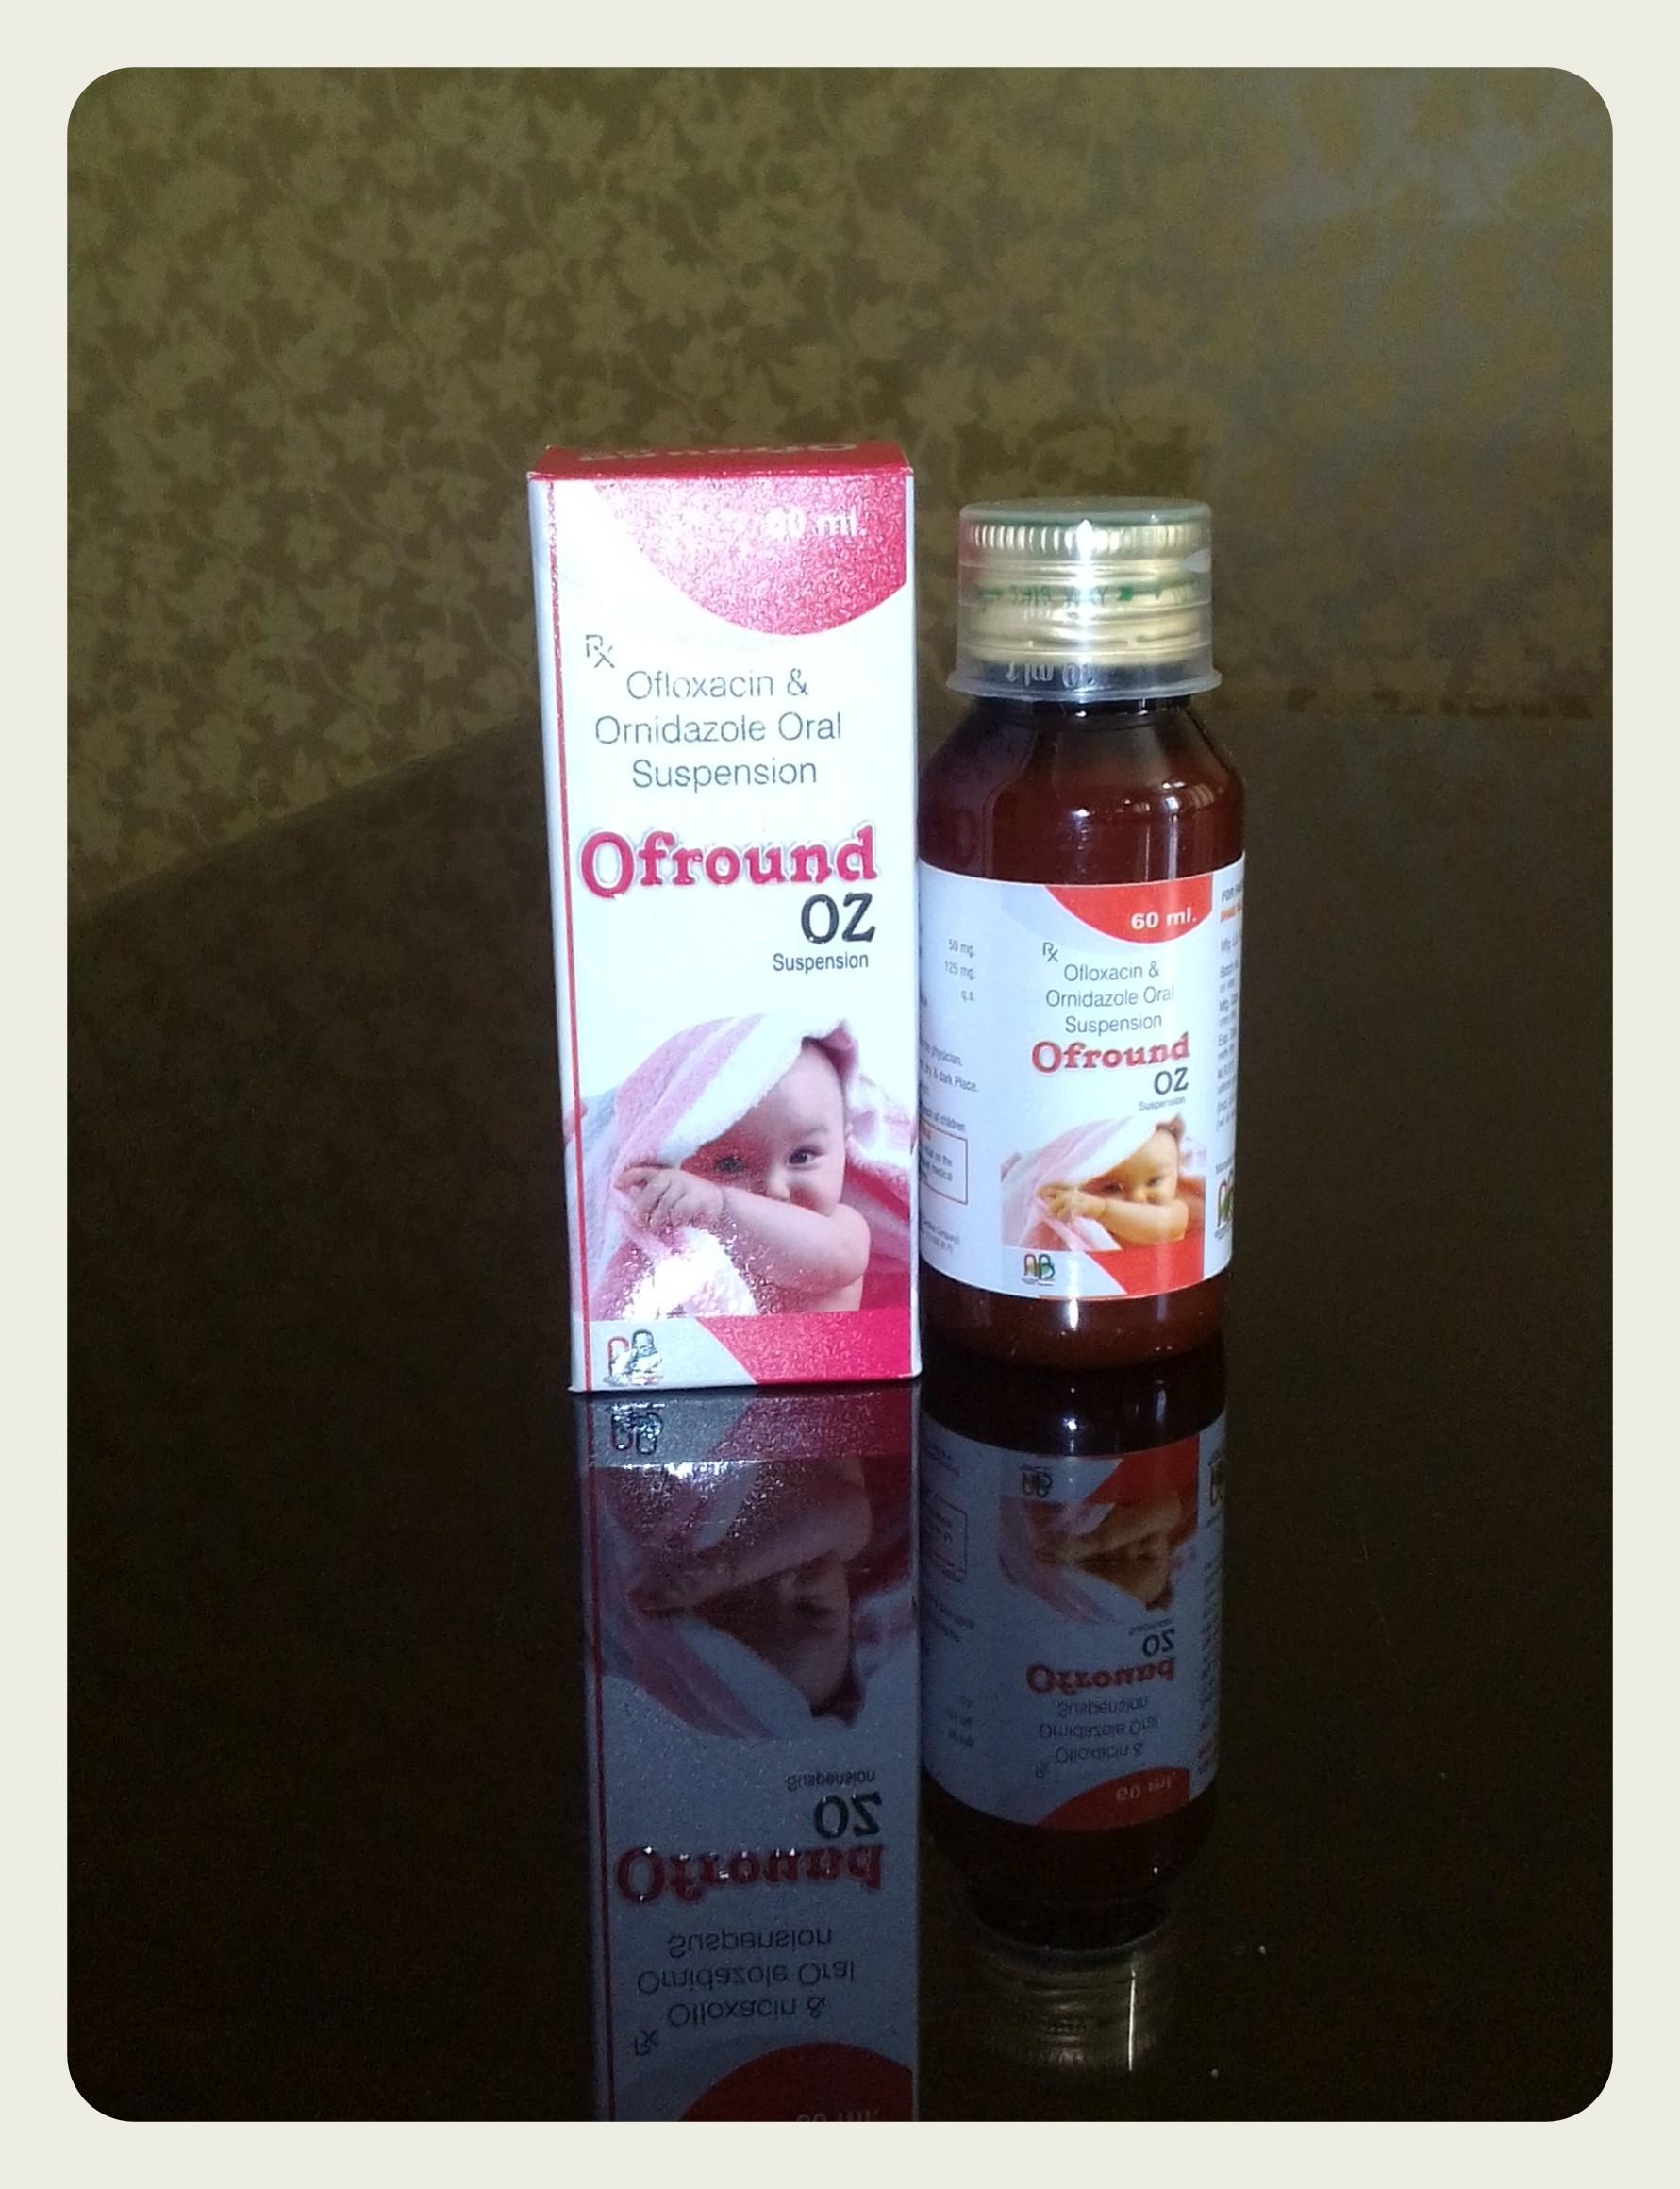 Ofloxacin with ornidazole Suspensions